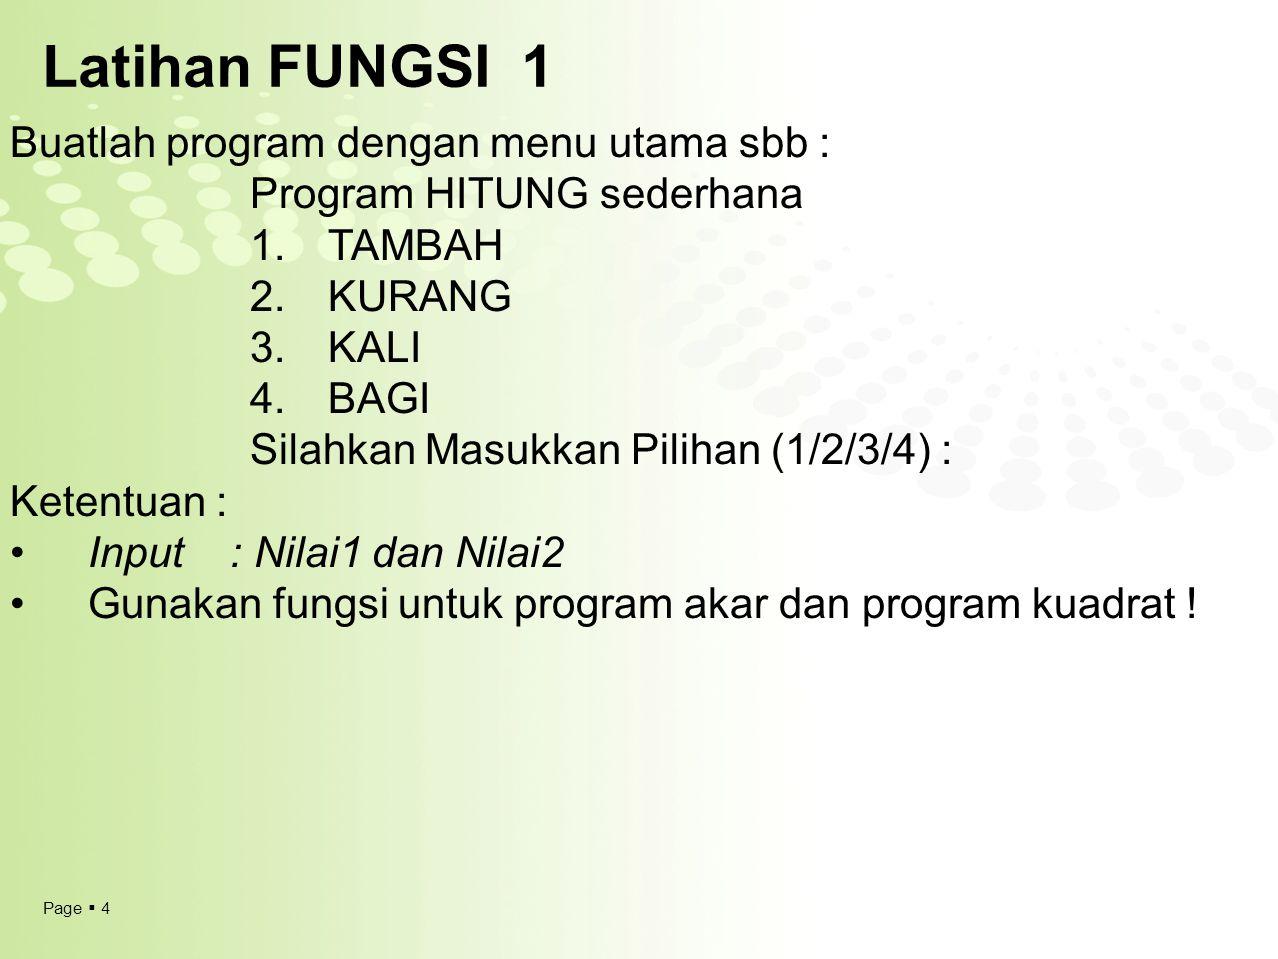 Page  5 Latihan FUNGSI 1 Buatlah program dengan menu utama sbb : Program HITUNG sederhana 1.TAMBAH 2.KURANG 3.KALI 4.BAGI Silahkan Masukkan Pilihan (1/2/3/4) : Ketentuan : Gunakan fungsi untuk program akar dan program kuadrat .